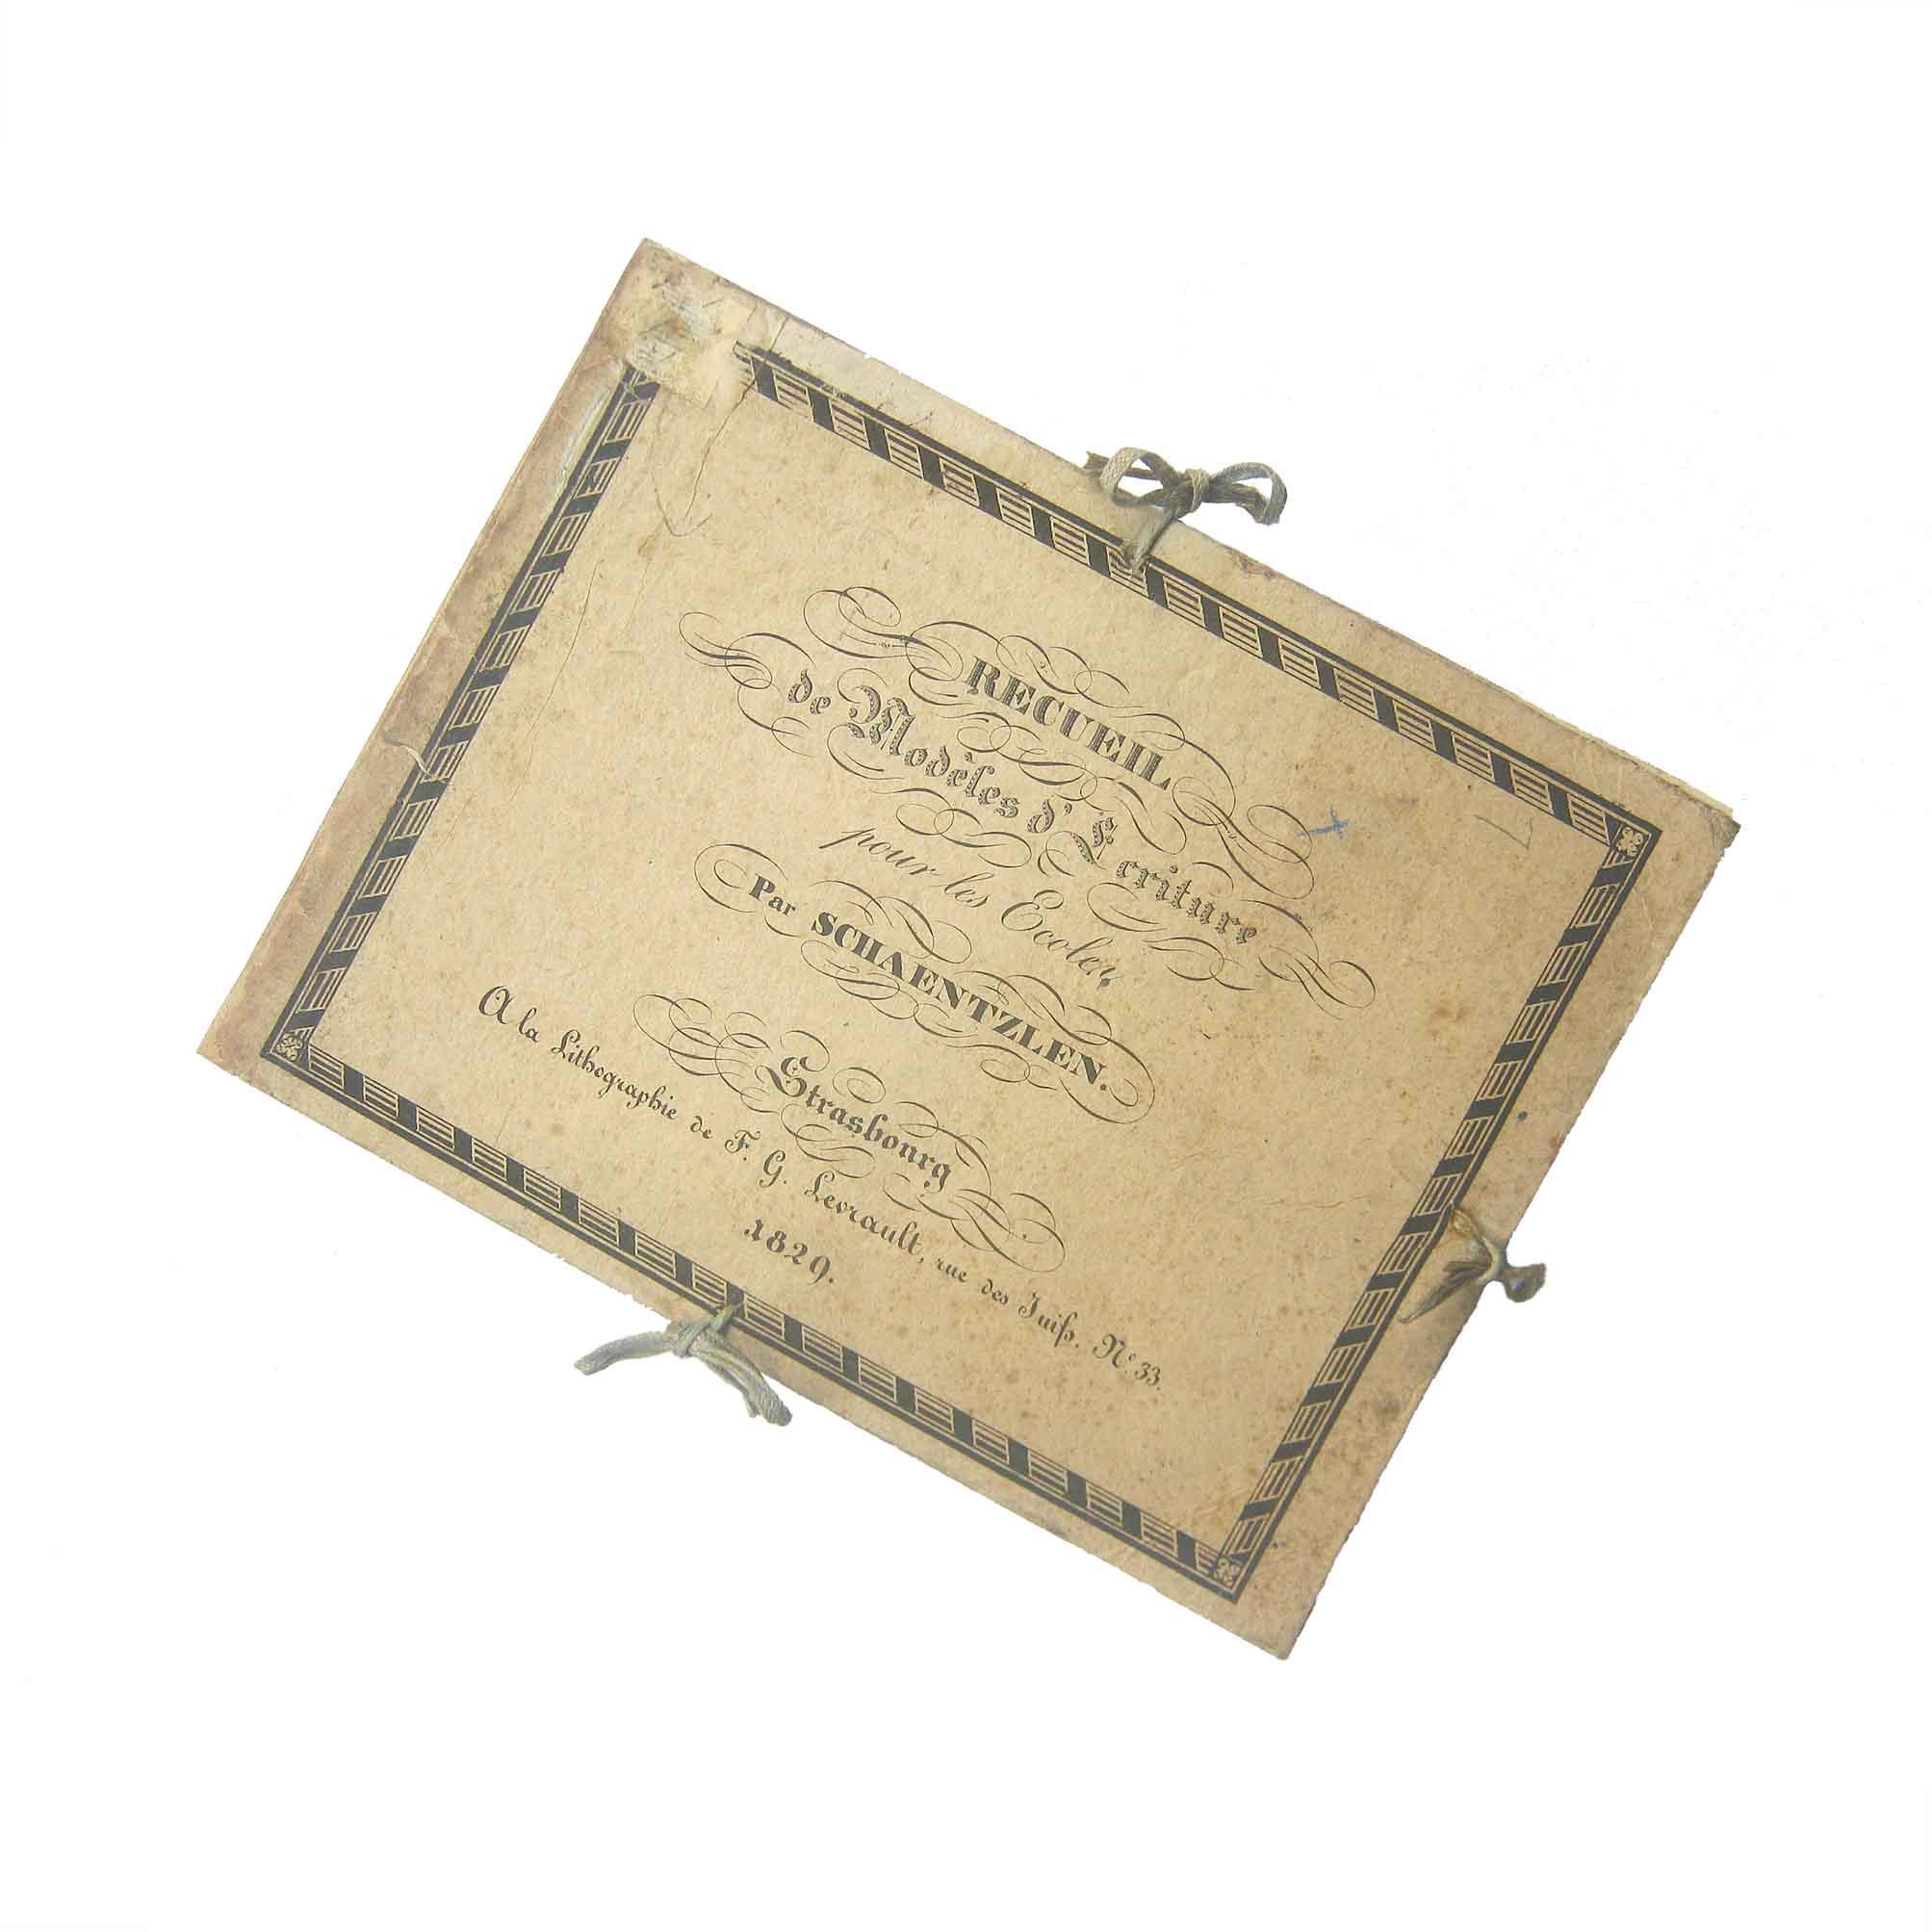 5533-Schaentzlen-Recueil-Ecriture-1829-Cover-free-N.jpg